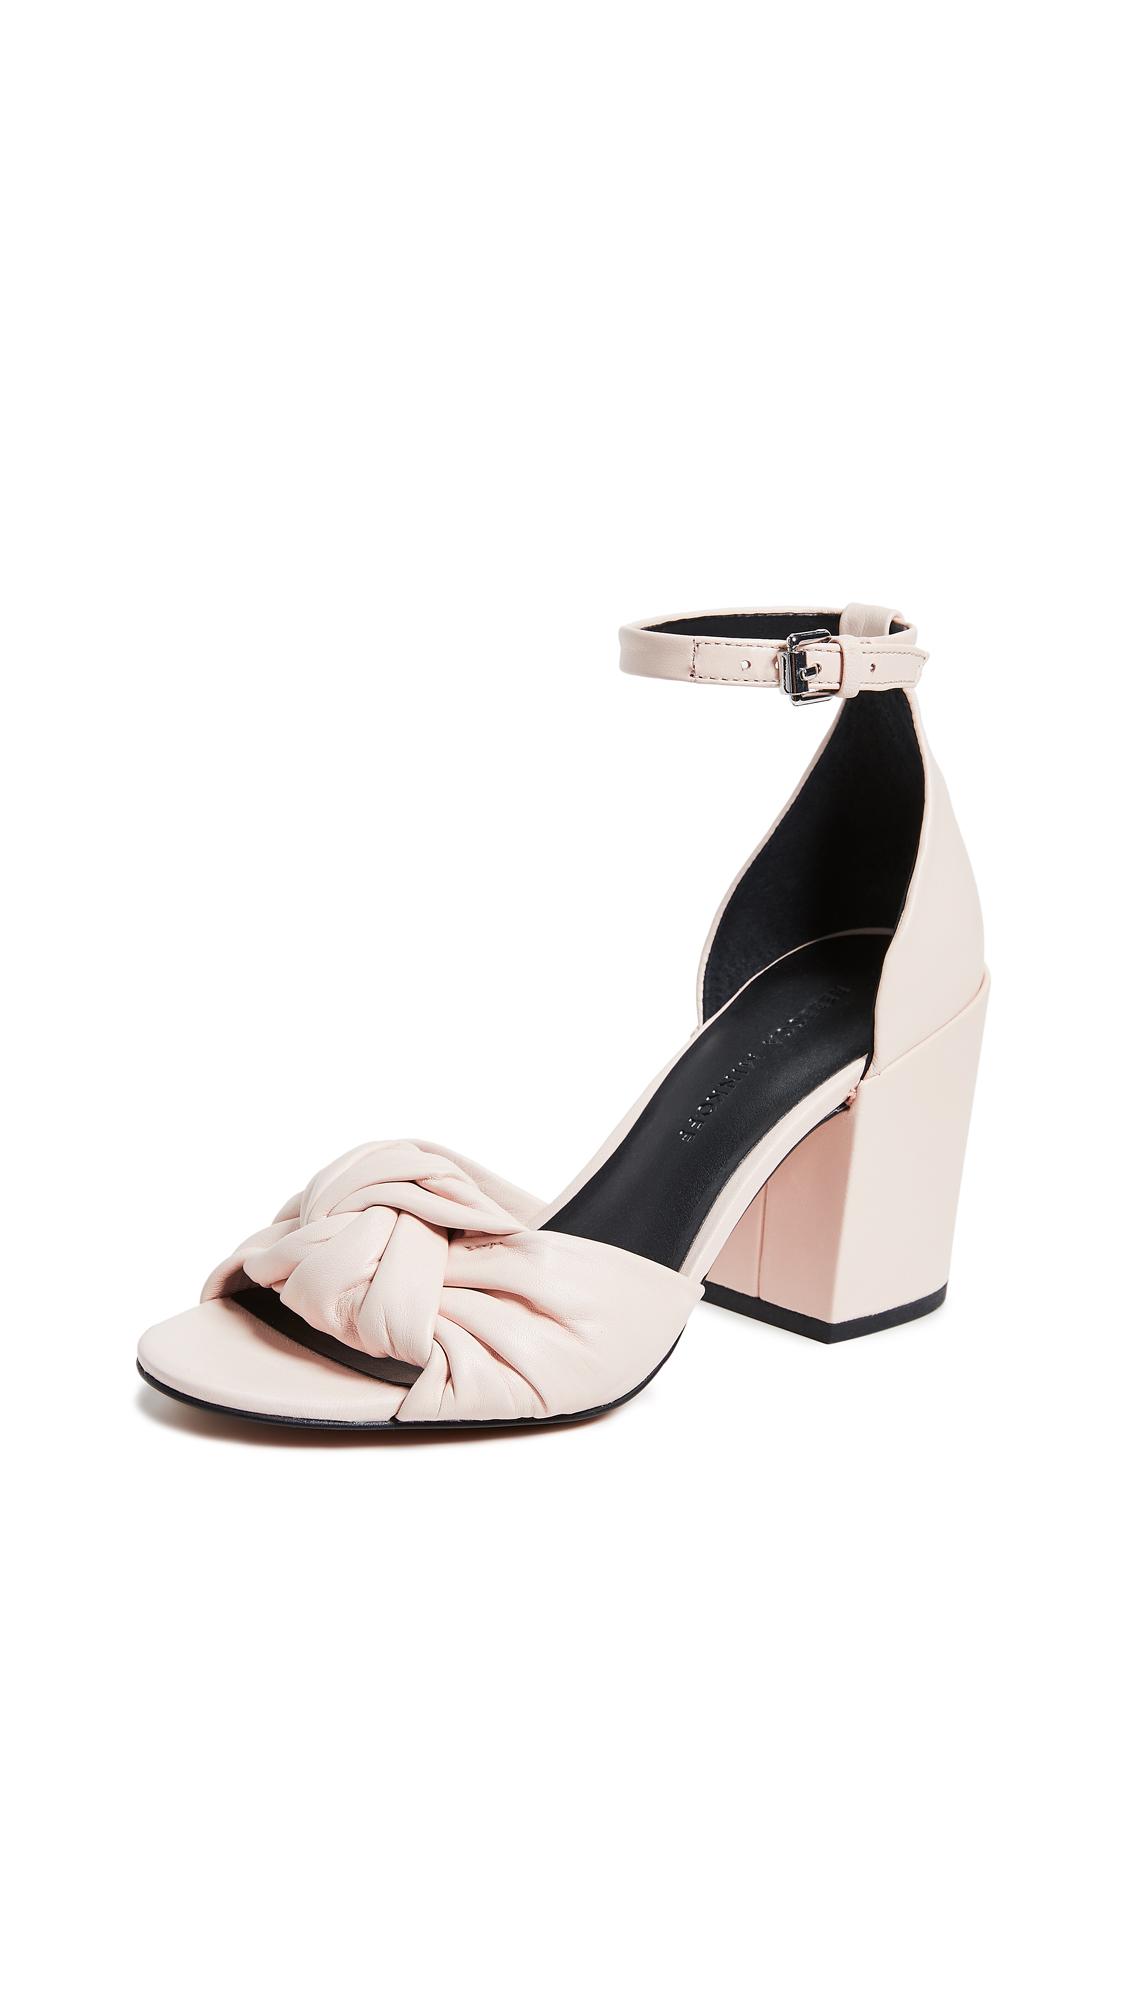 Rebecca Minkoff Capriana DOrsay Sandals - Puff